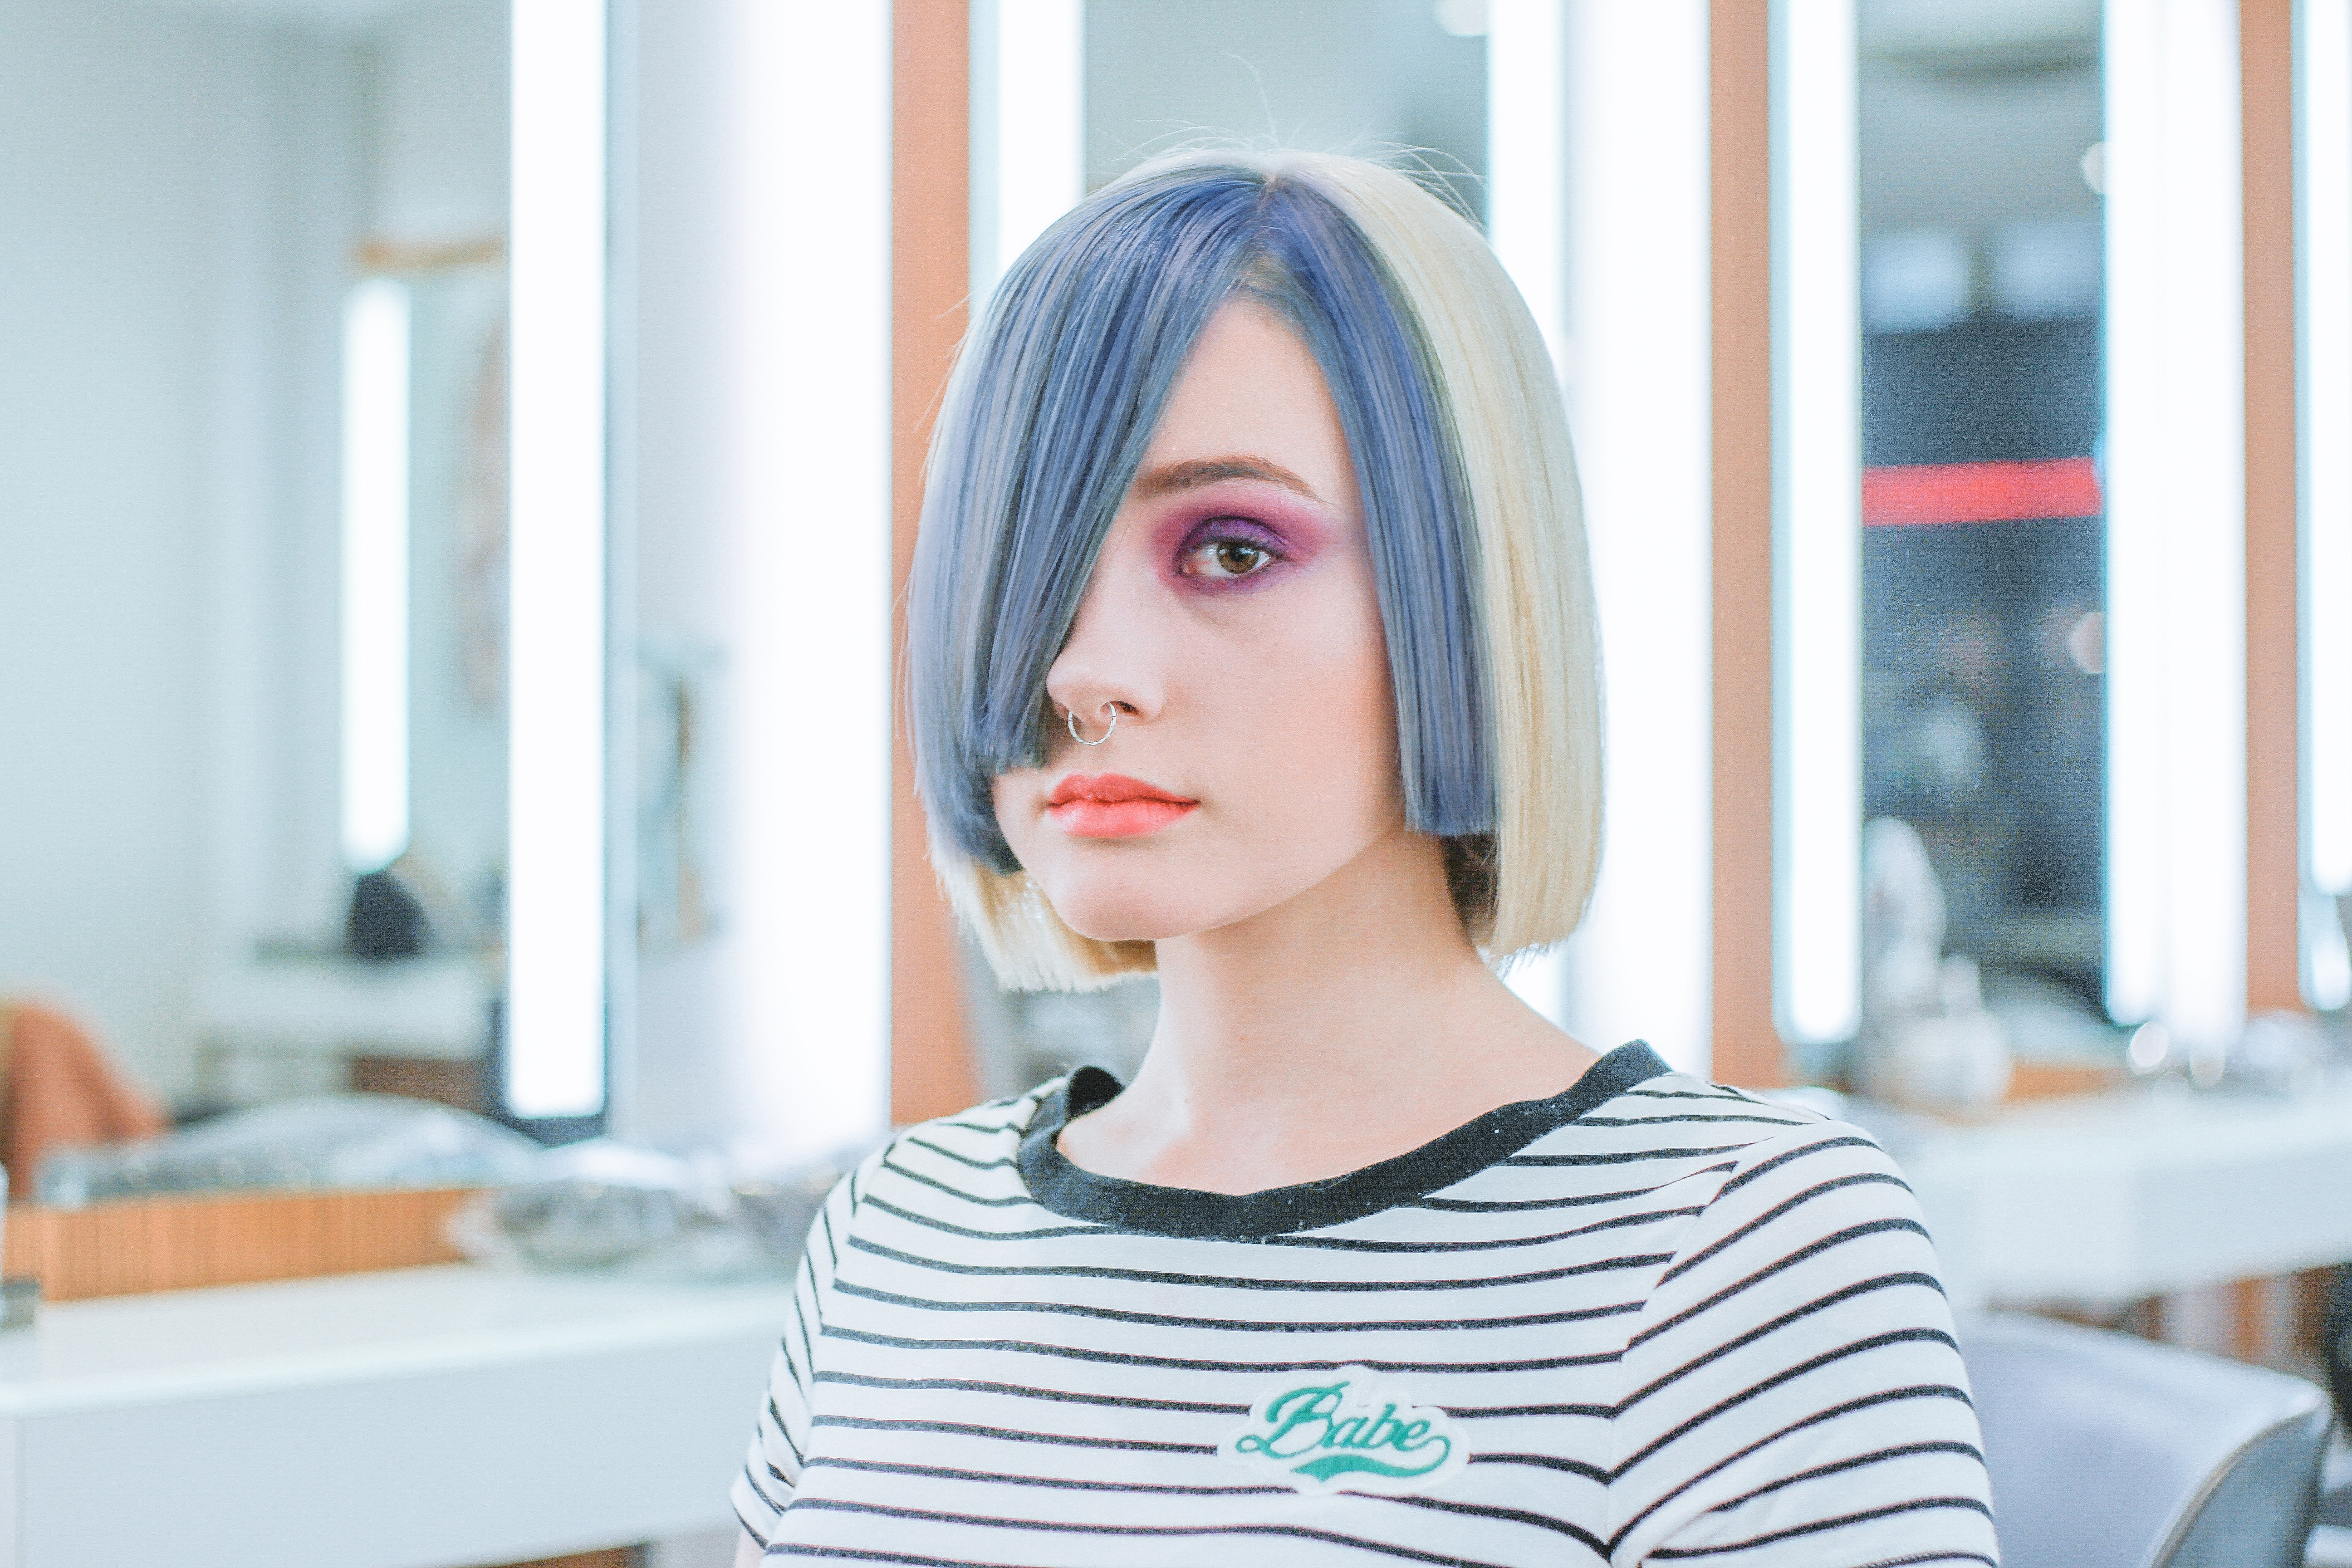 A girl with colourful hair leaving the salon